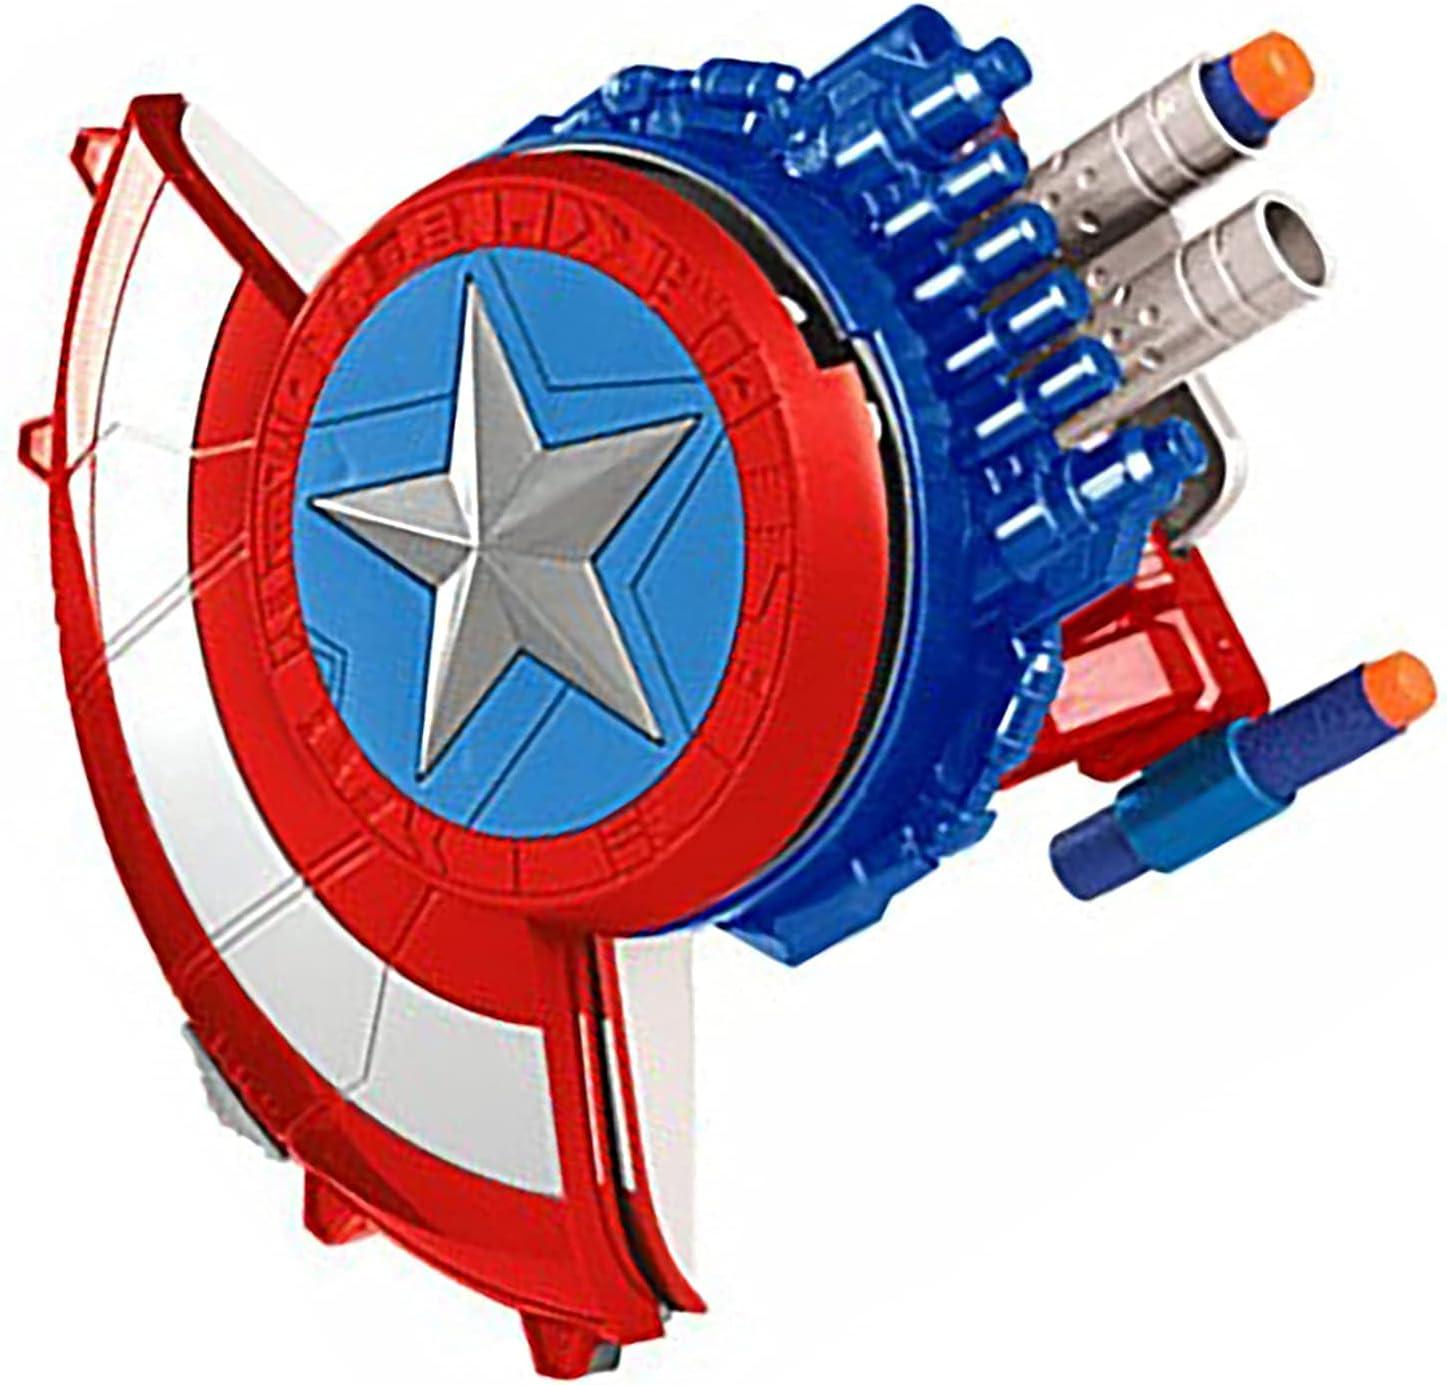 Wuqiqi-yeyi Marvel Avengers Series Capitán América Shield Pistol Bomb Toy para niños con 10 Bombas Suaves de Lanzamiento Adecuado para Cosplay Bomb Launcher